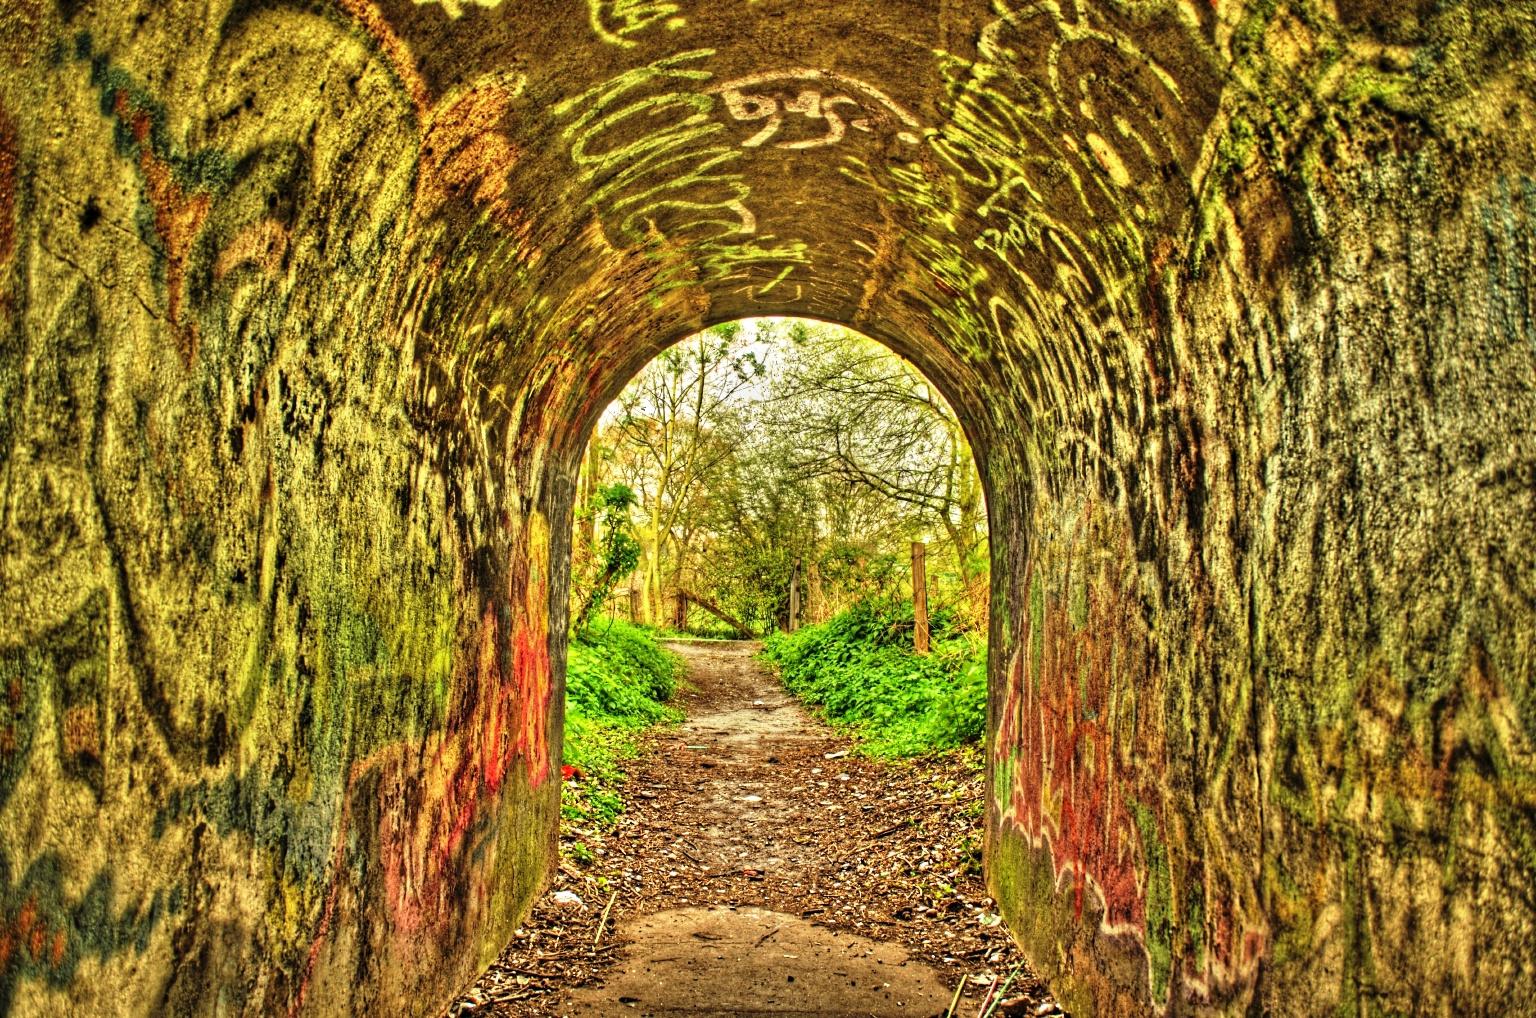 Tunnelausgang